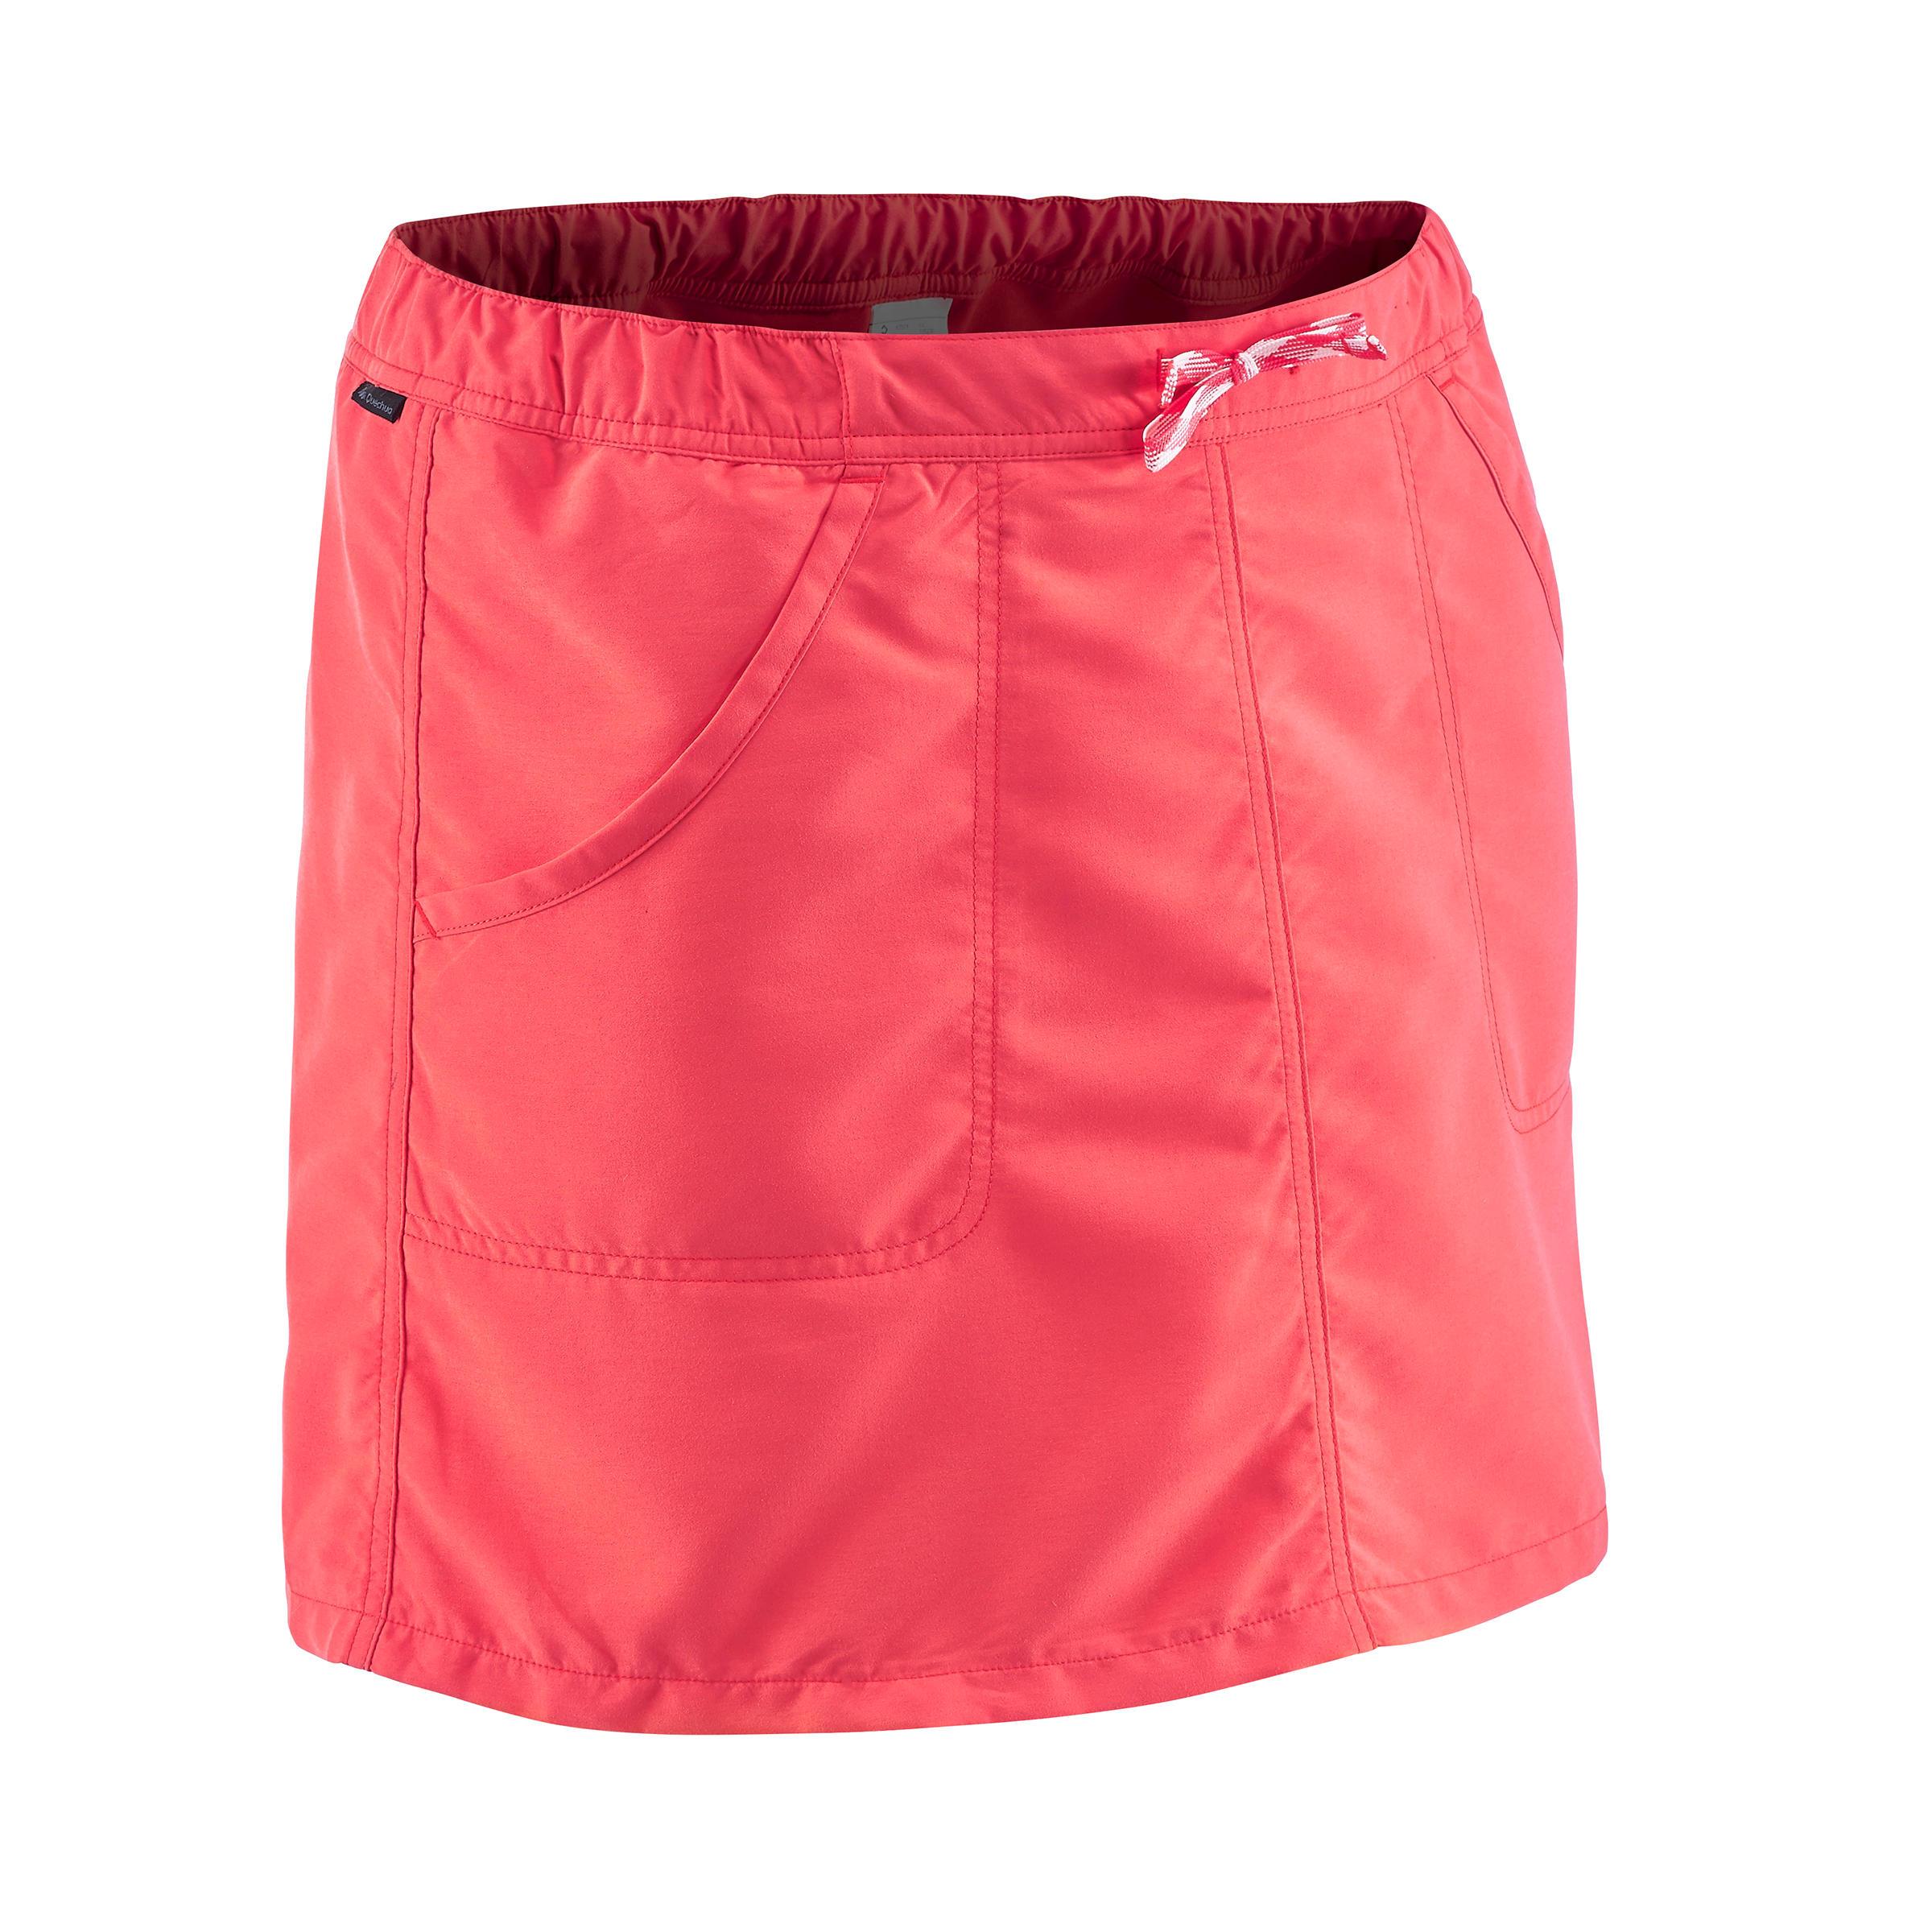 best wholesaler in stock shop best sellers Shorts et jupes femme | Randonnée - Trek | Decathlon